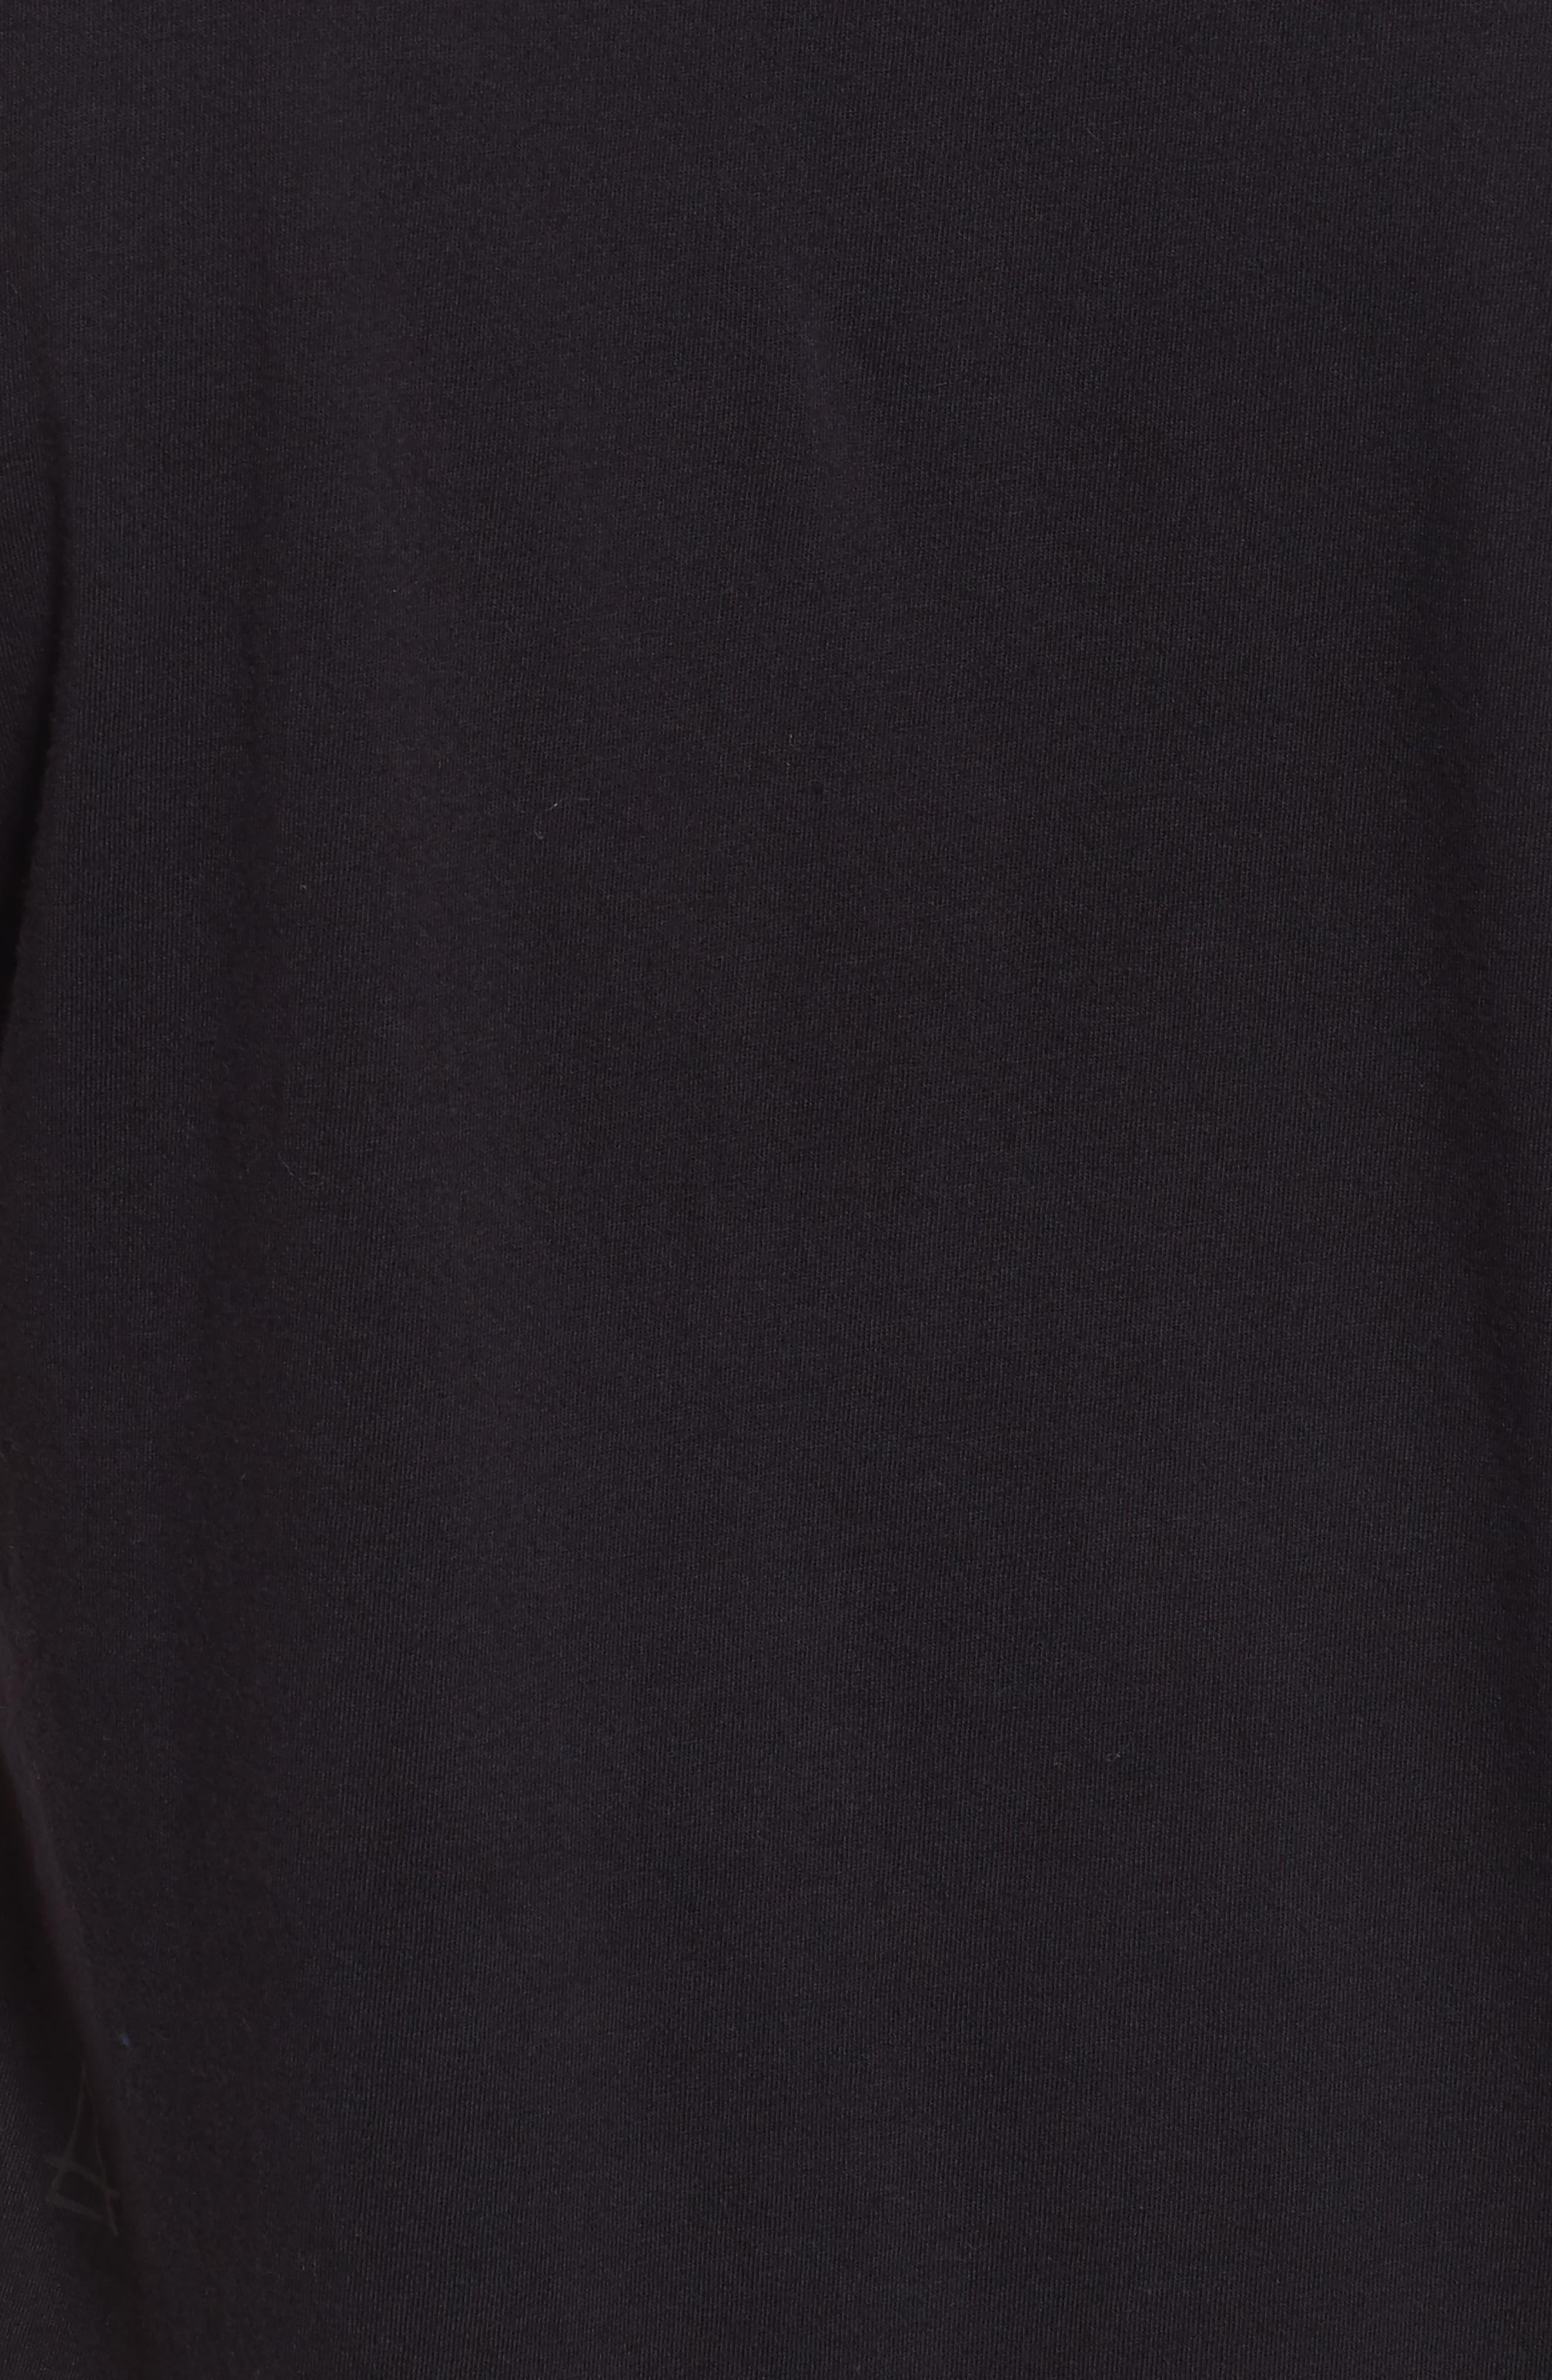 Thug for Life T-Shirt,                             Alternate thumbnail 5, color,                             Black